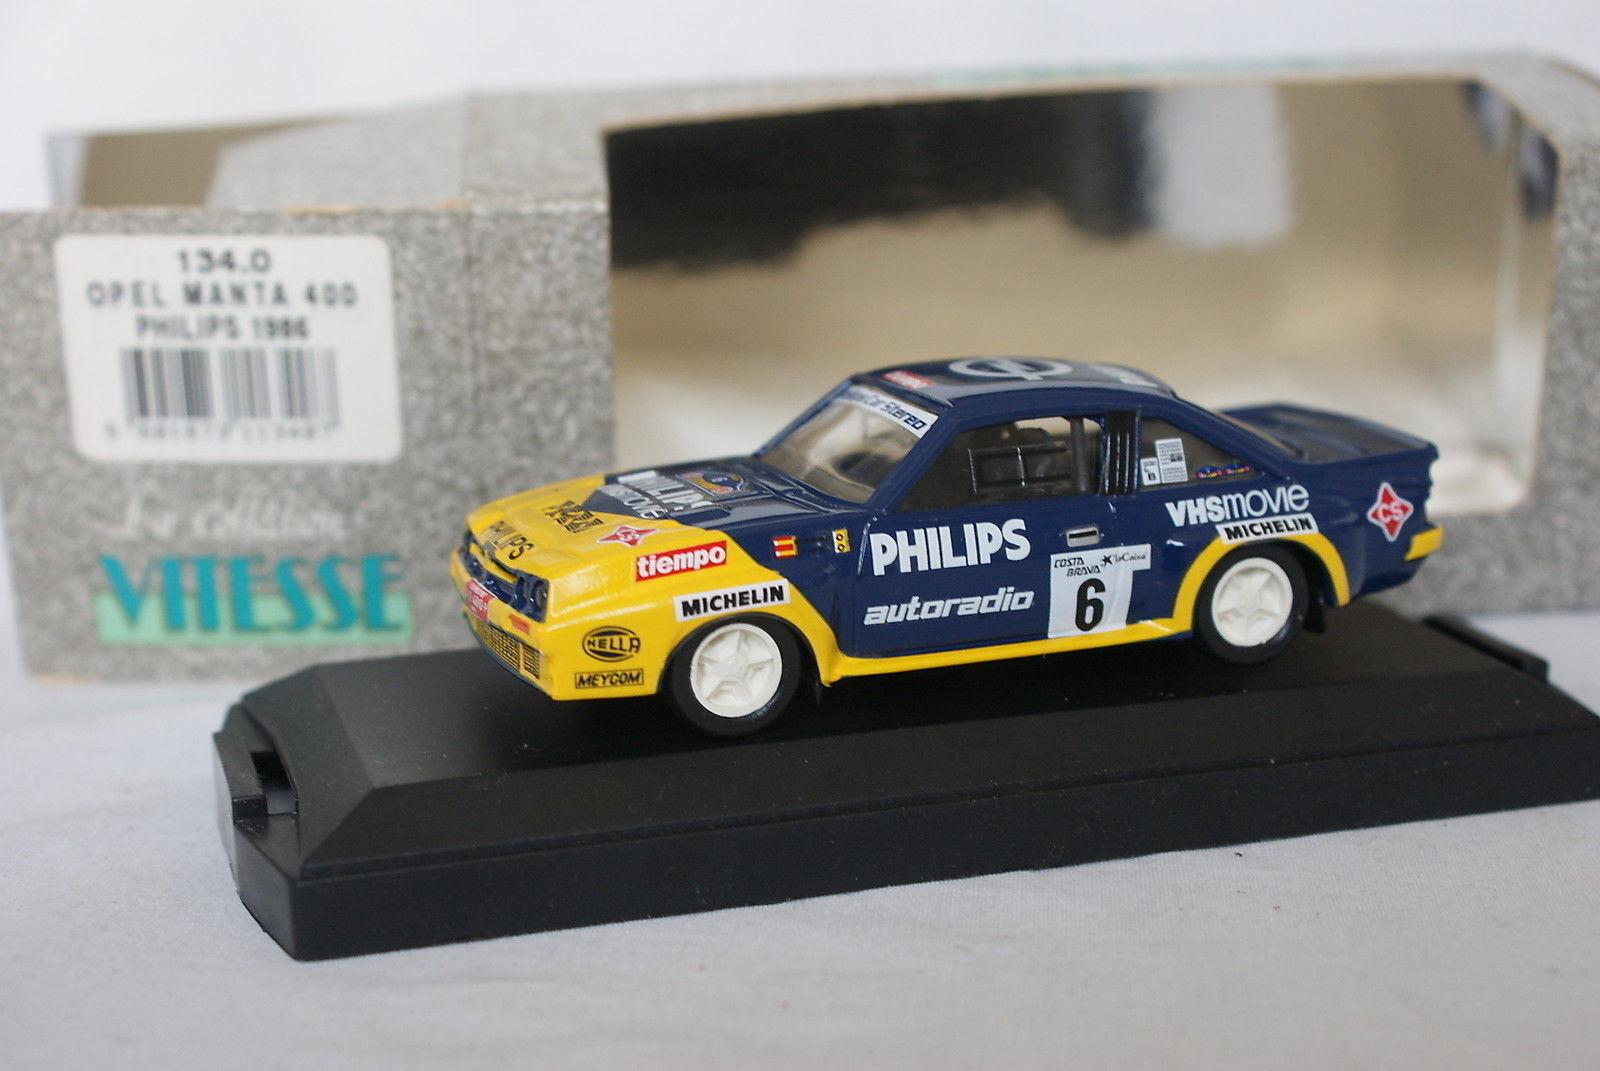 Vitesse 1 43 - Opel Manta 400 Philips Costa Brava 1986 + box